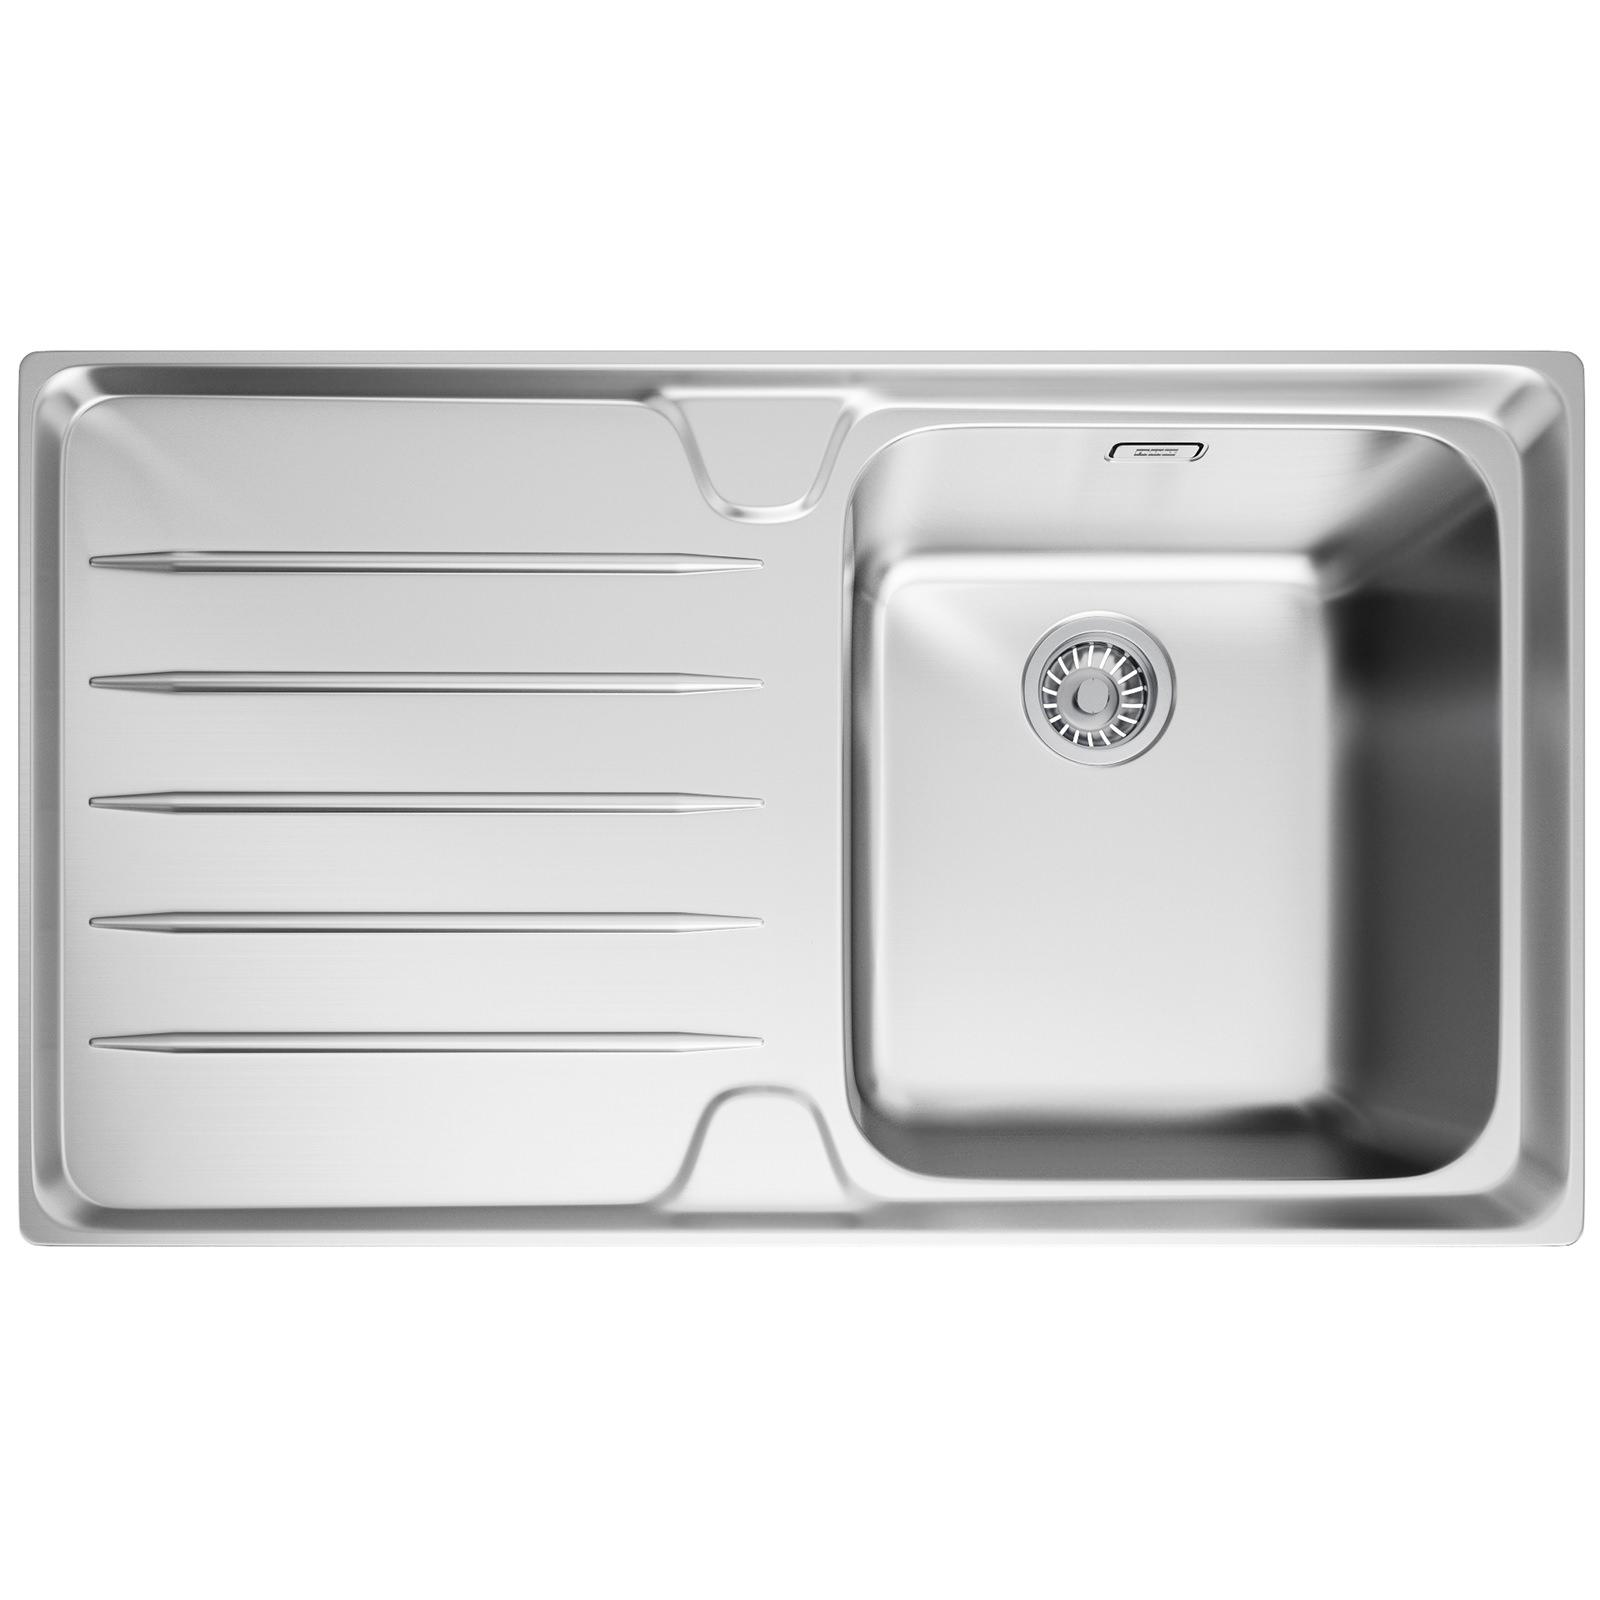 Franke Square Inset Sink : Franke Laser LSX 611 Stainless Steel Left Hand Drainer 1.0 Bowl Inset ...